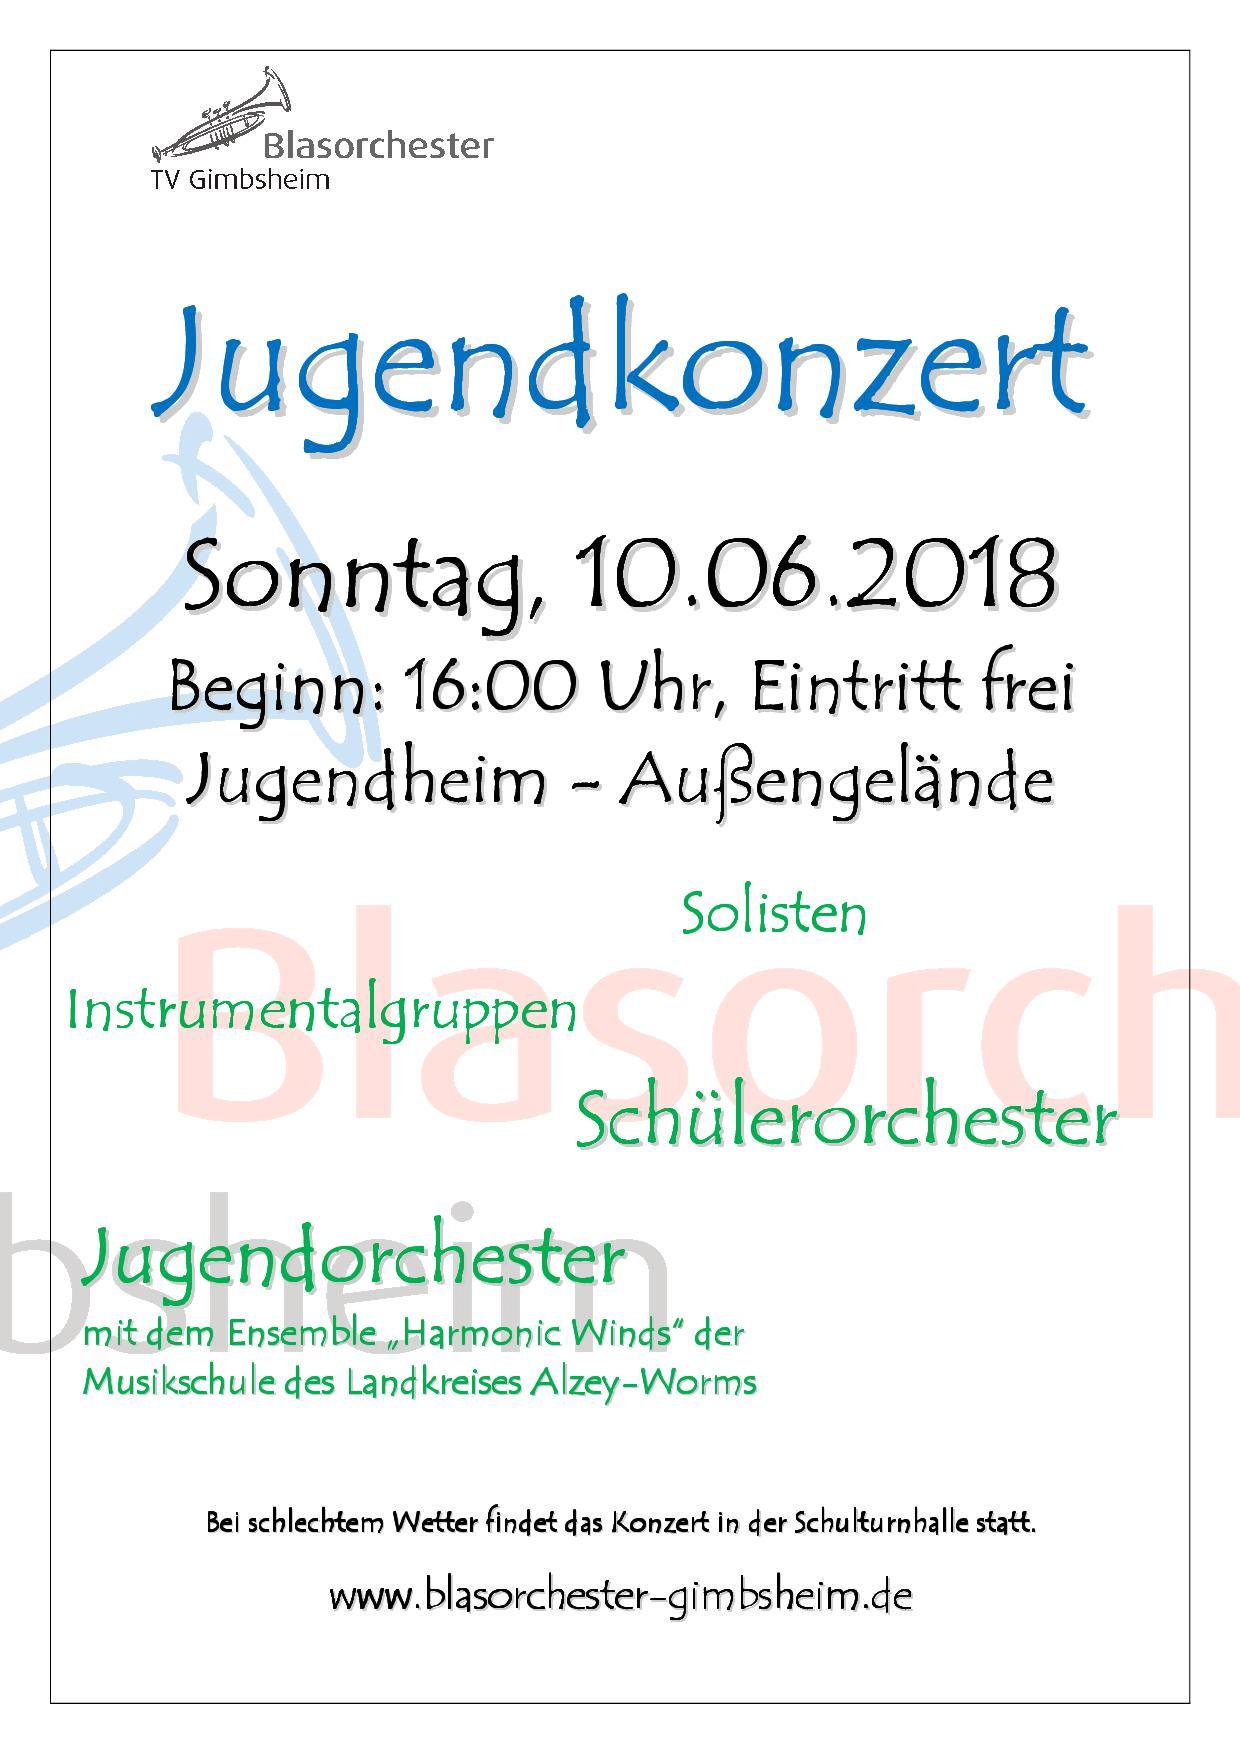 Großes Jugendkonzert